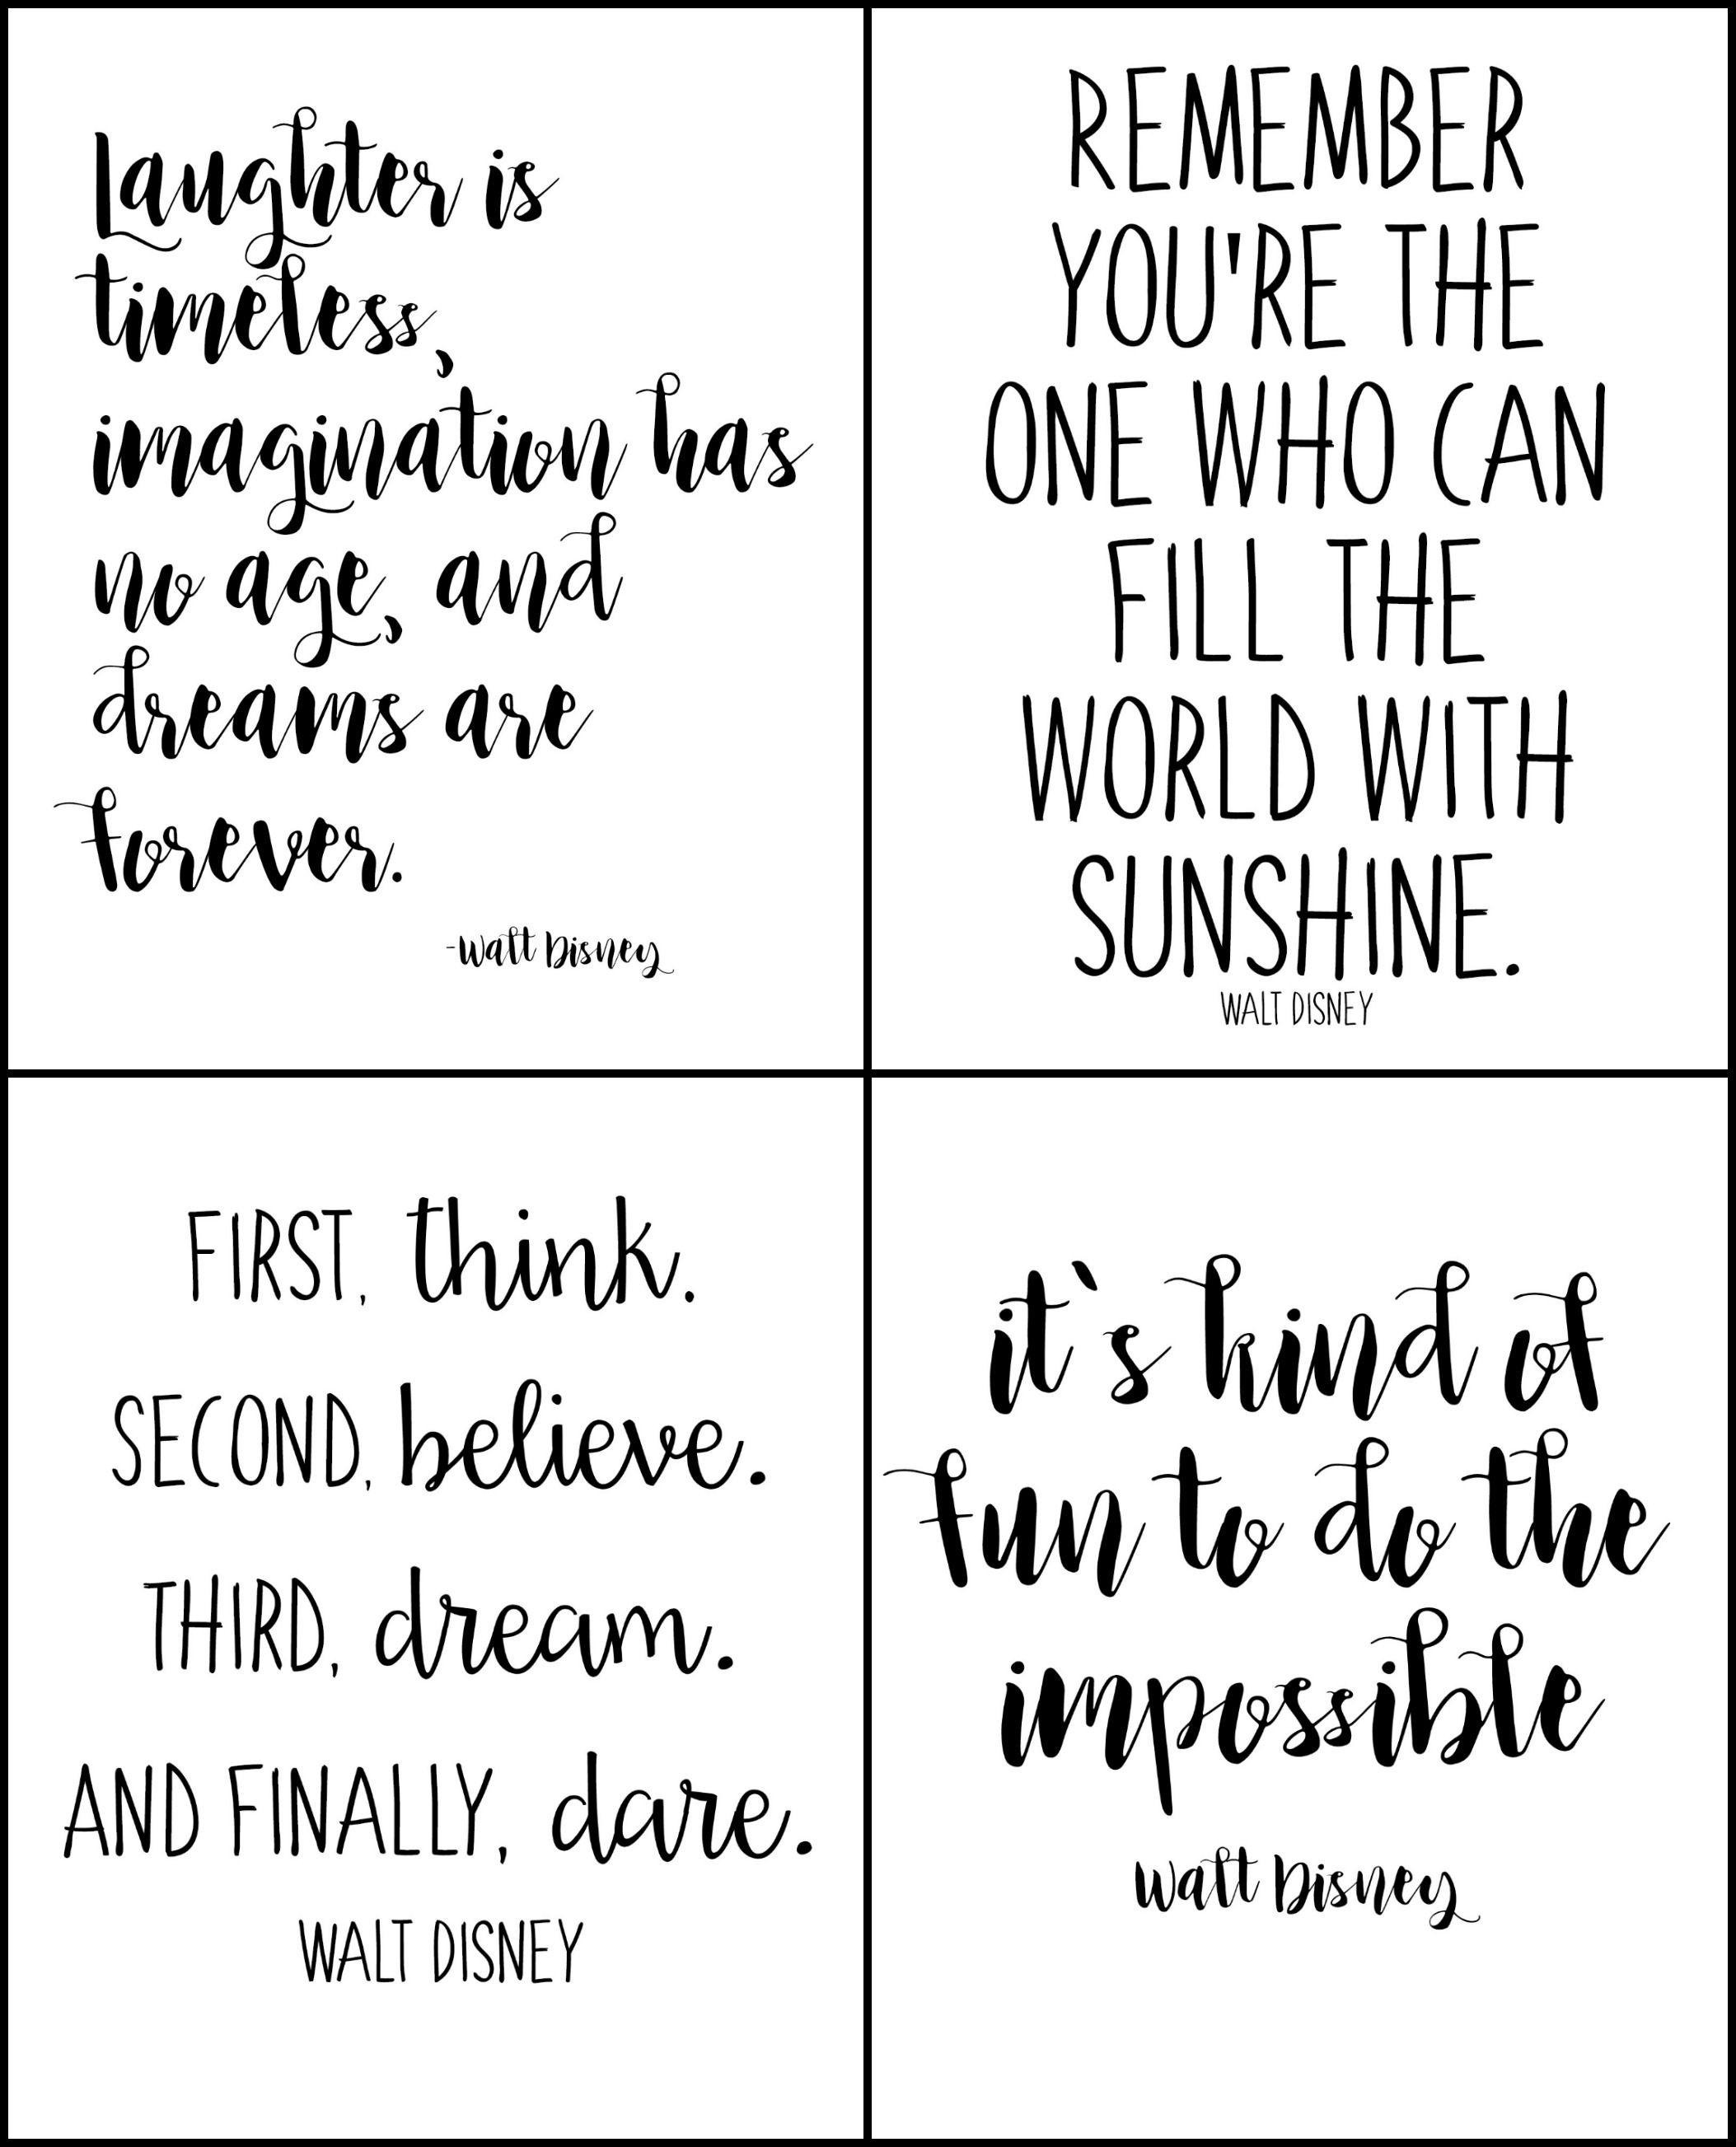 Free Printable Walt Disney Quotes | Disney | Walt Disney Quotes - Free Printable Quotes